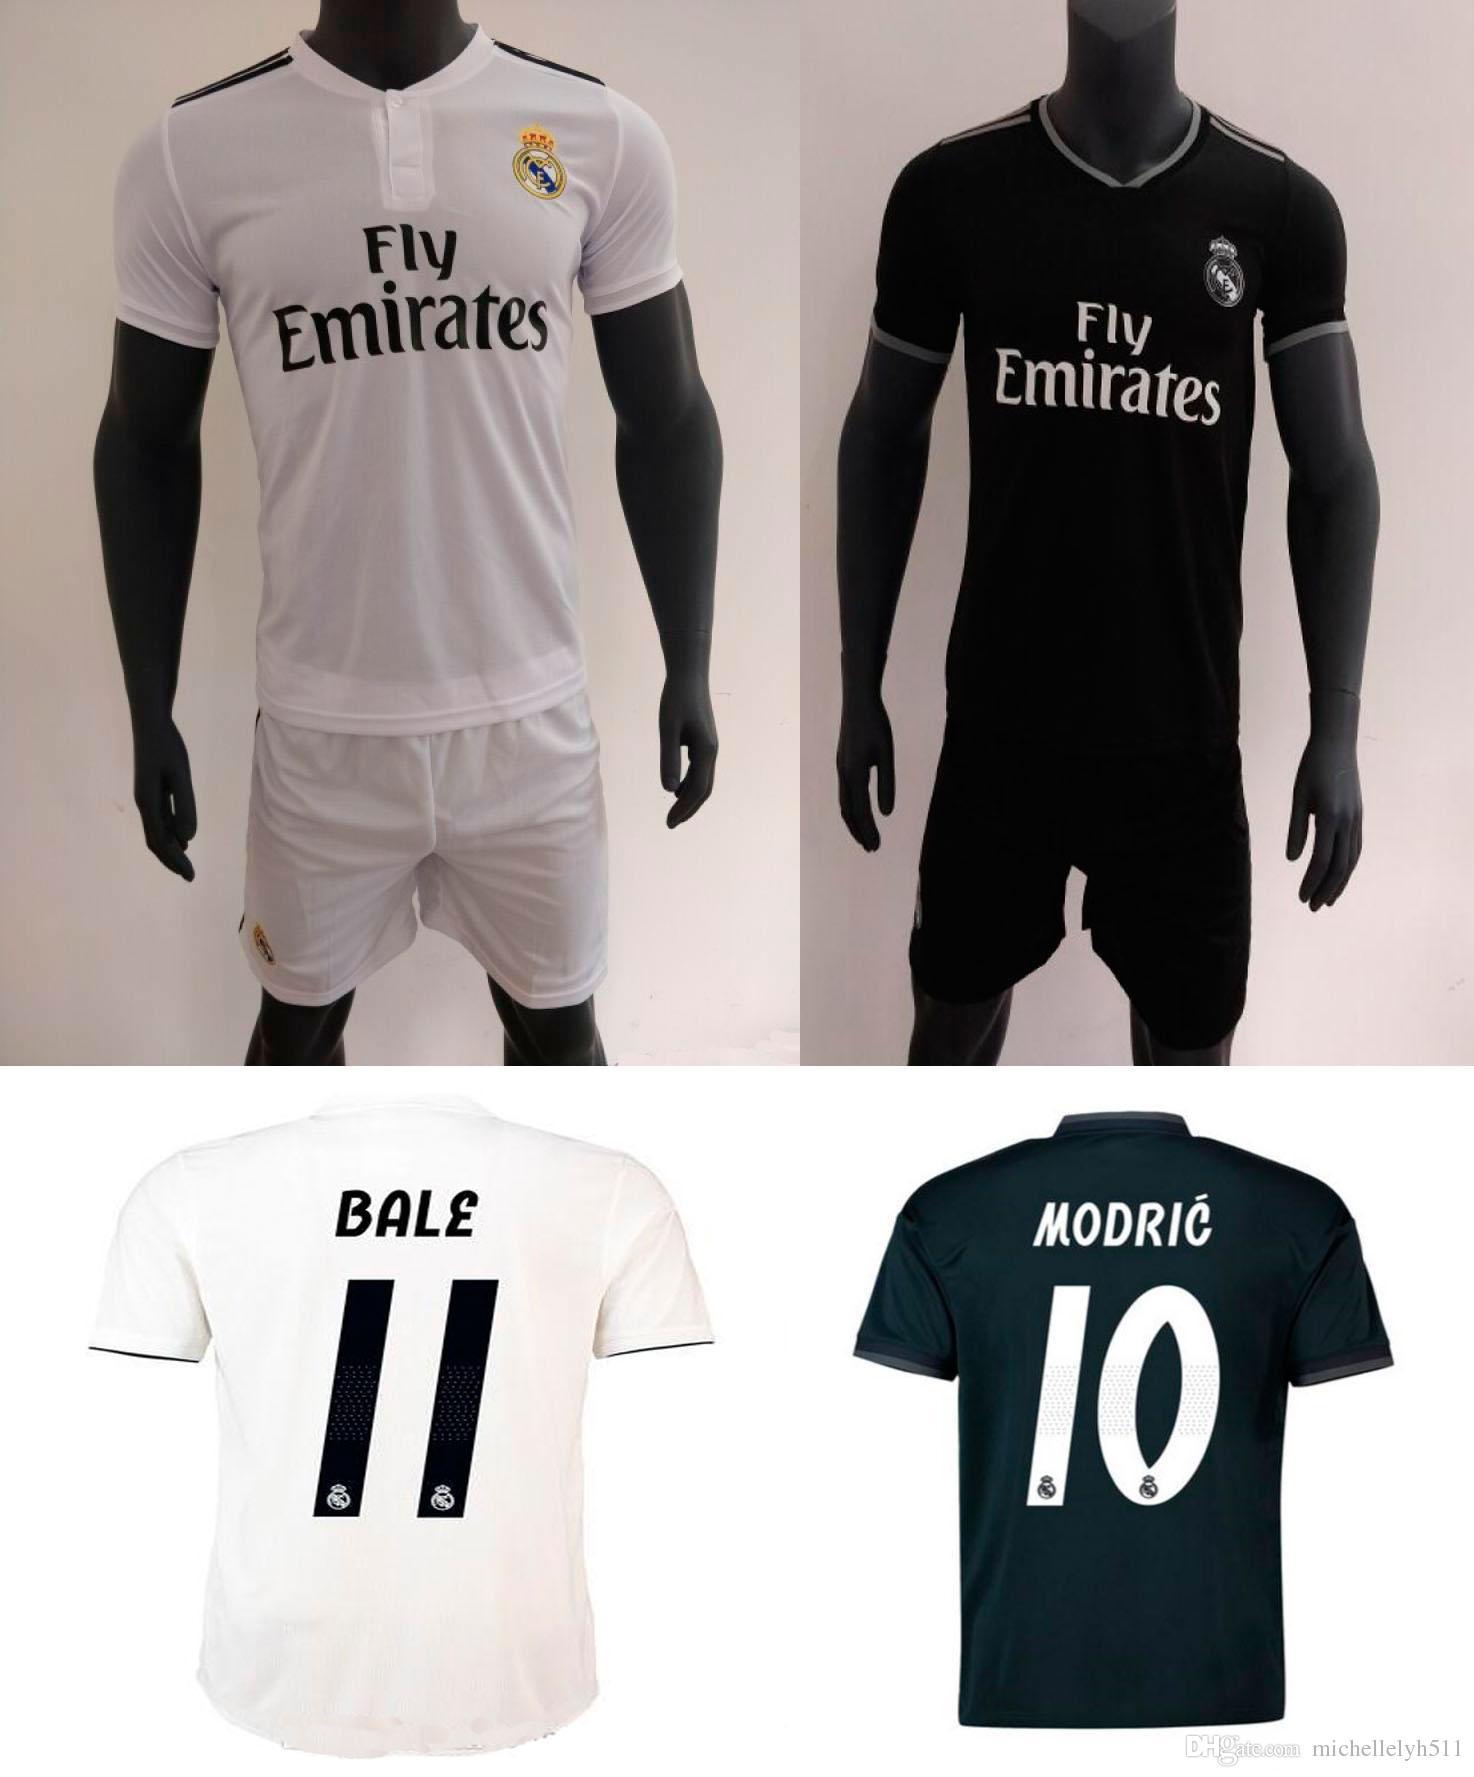 b466e6780 Compre 18 19 Real Madrid Casa Fora De Futebol Jersey Shorts 2018 2019  Ronaldo ASENSIO Bale Kroos Kits De Futebol ISCO Camiseta De Fútbol Camisa  De Futebol ...